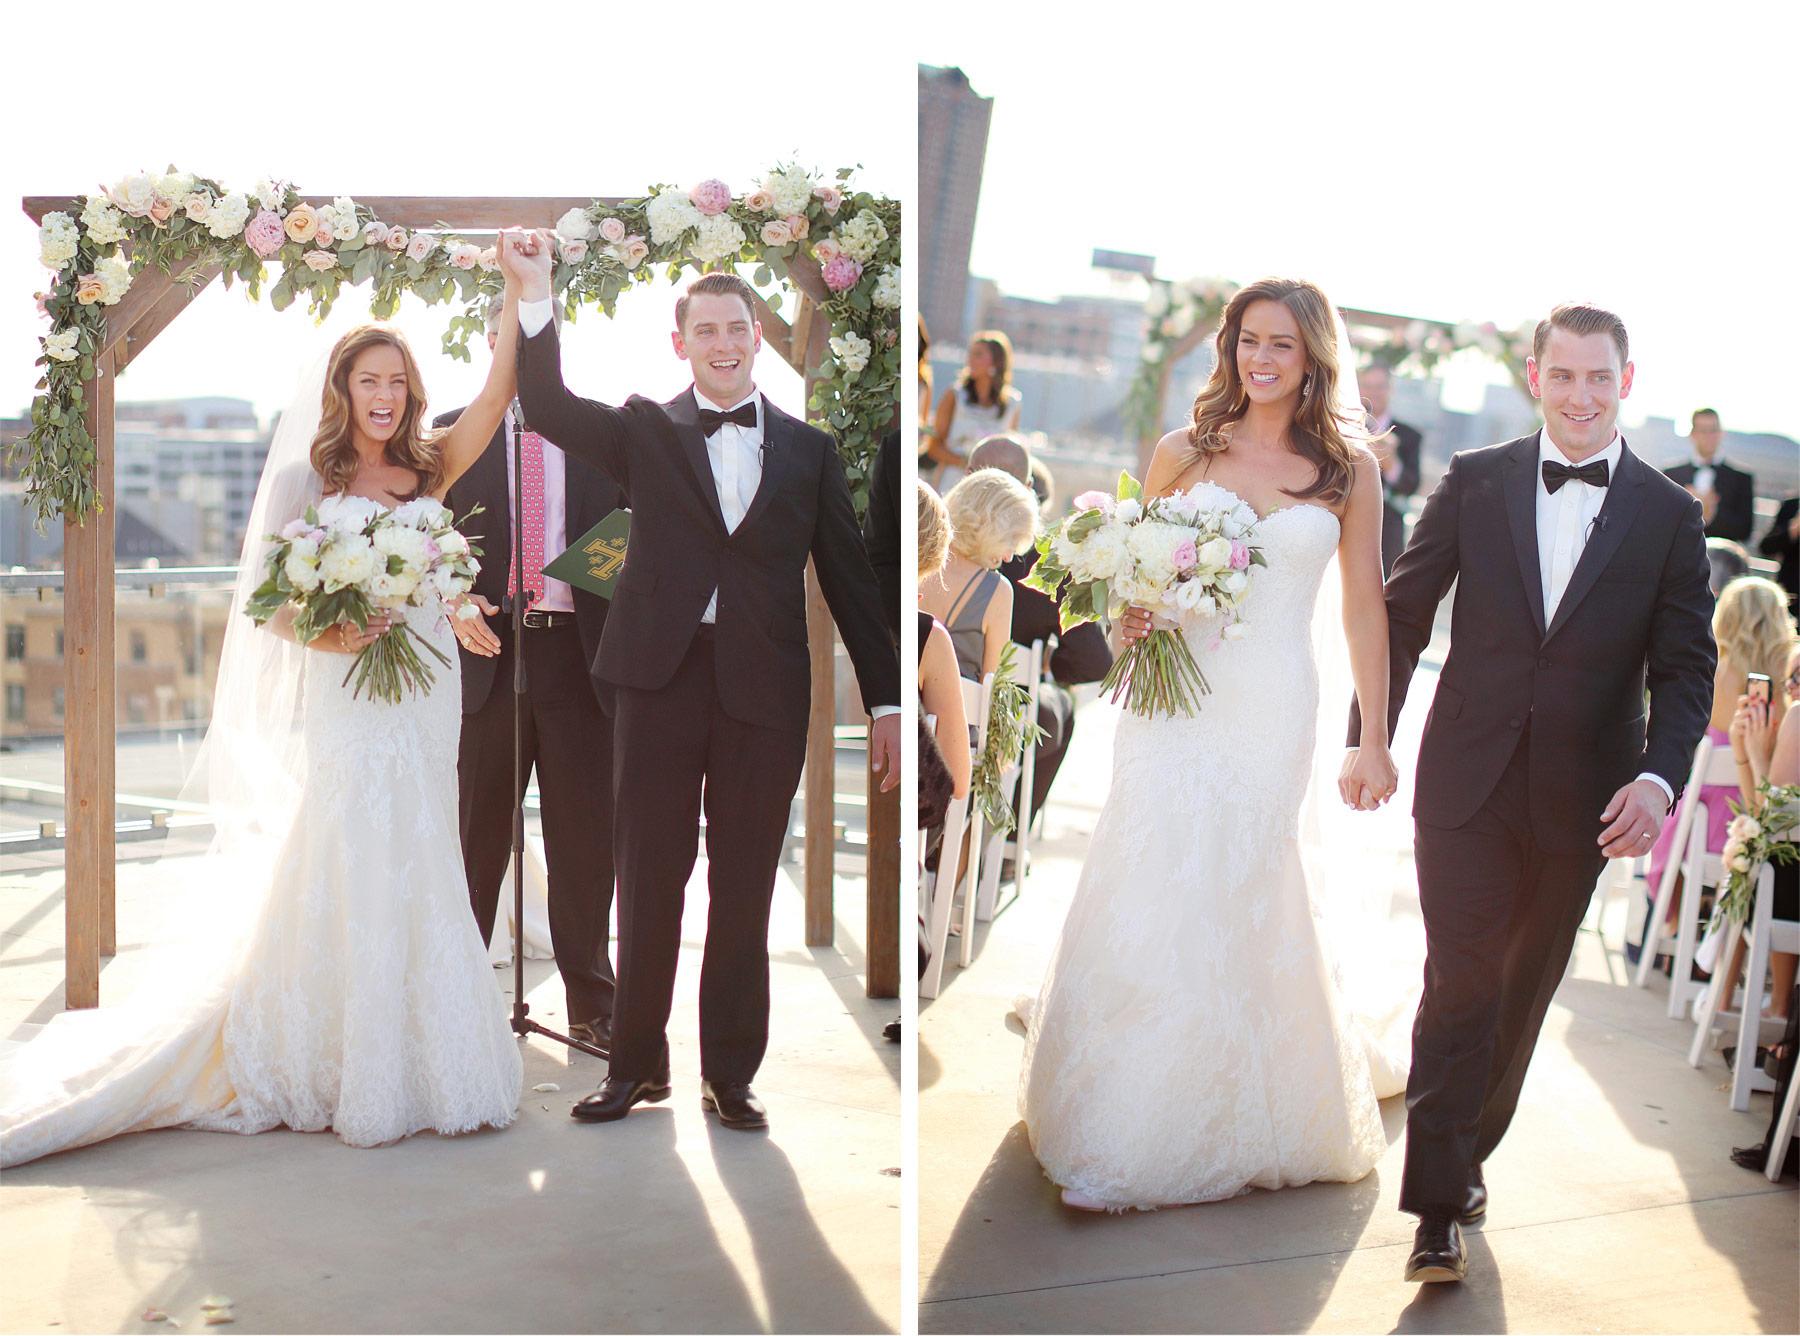 20-Saint-Paul-Minnesota-Wedding-Photographer-by-Andrew-Vick-Photography-Summer-Abulae-Ceremony-Bride-Groom-Kiss-Dress-Molly-and-Dan.jpg